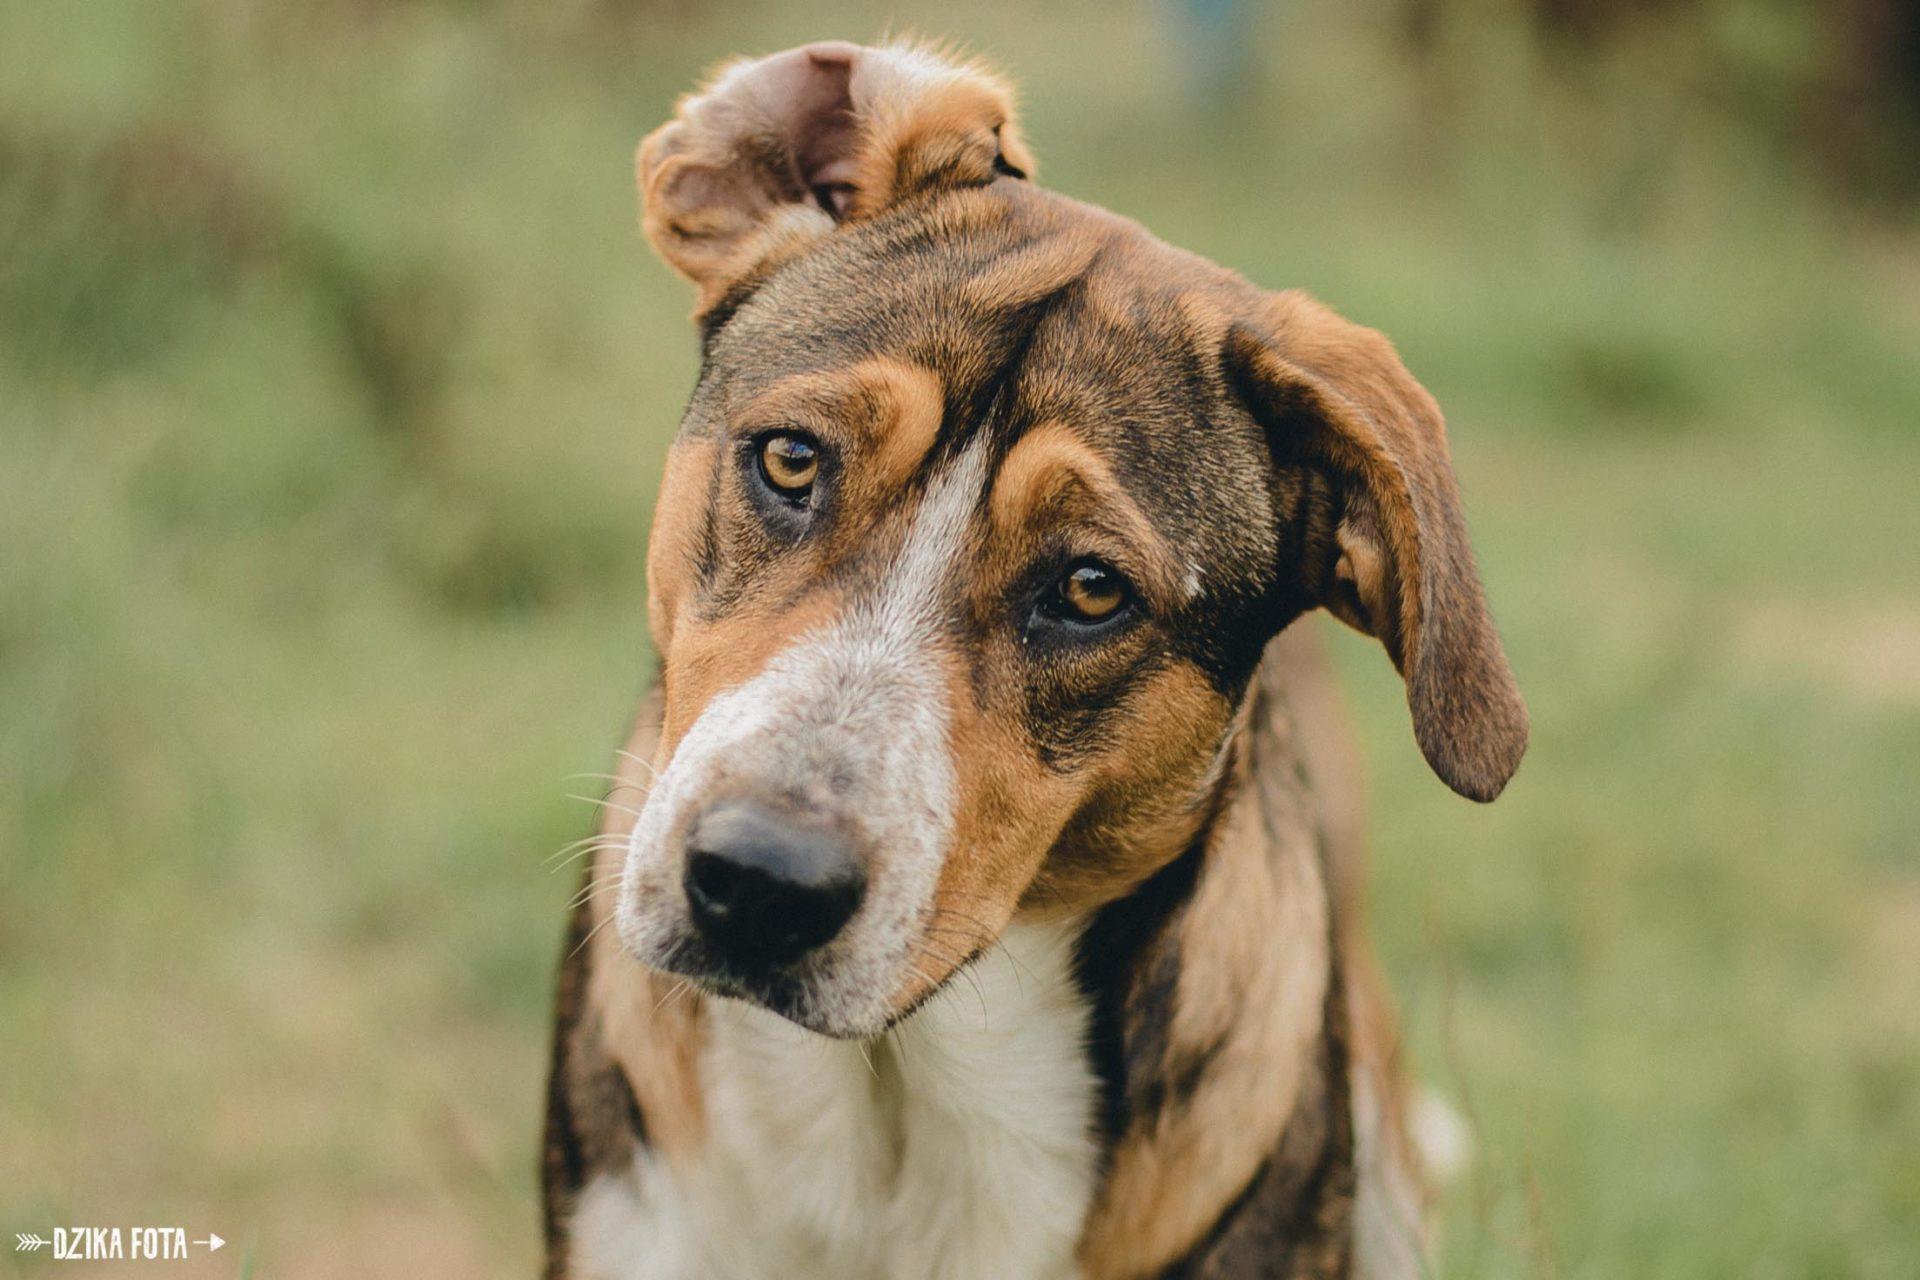 psiaki schronisko pies